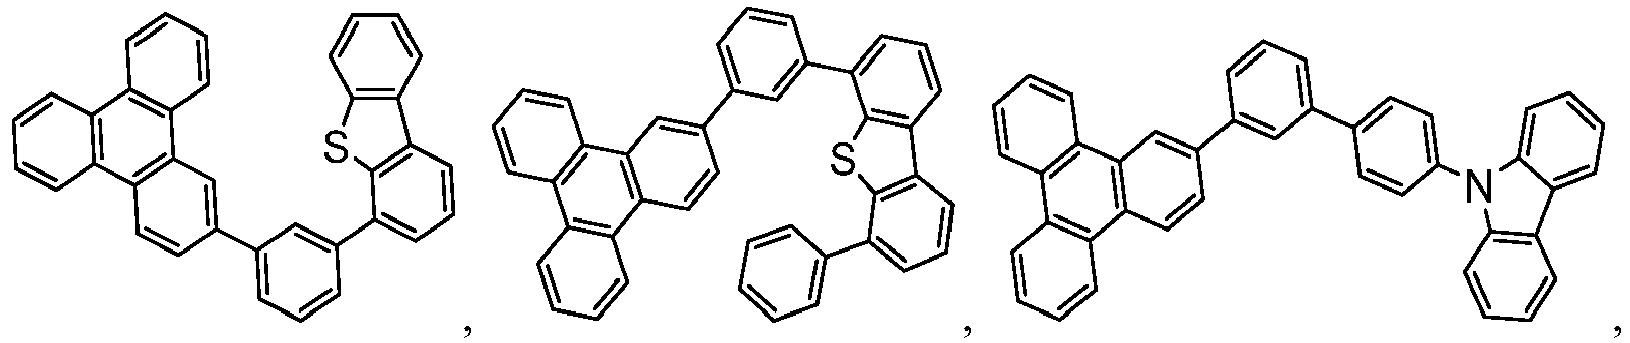 Figure imgb0437